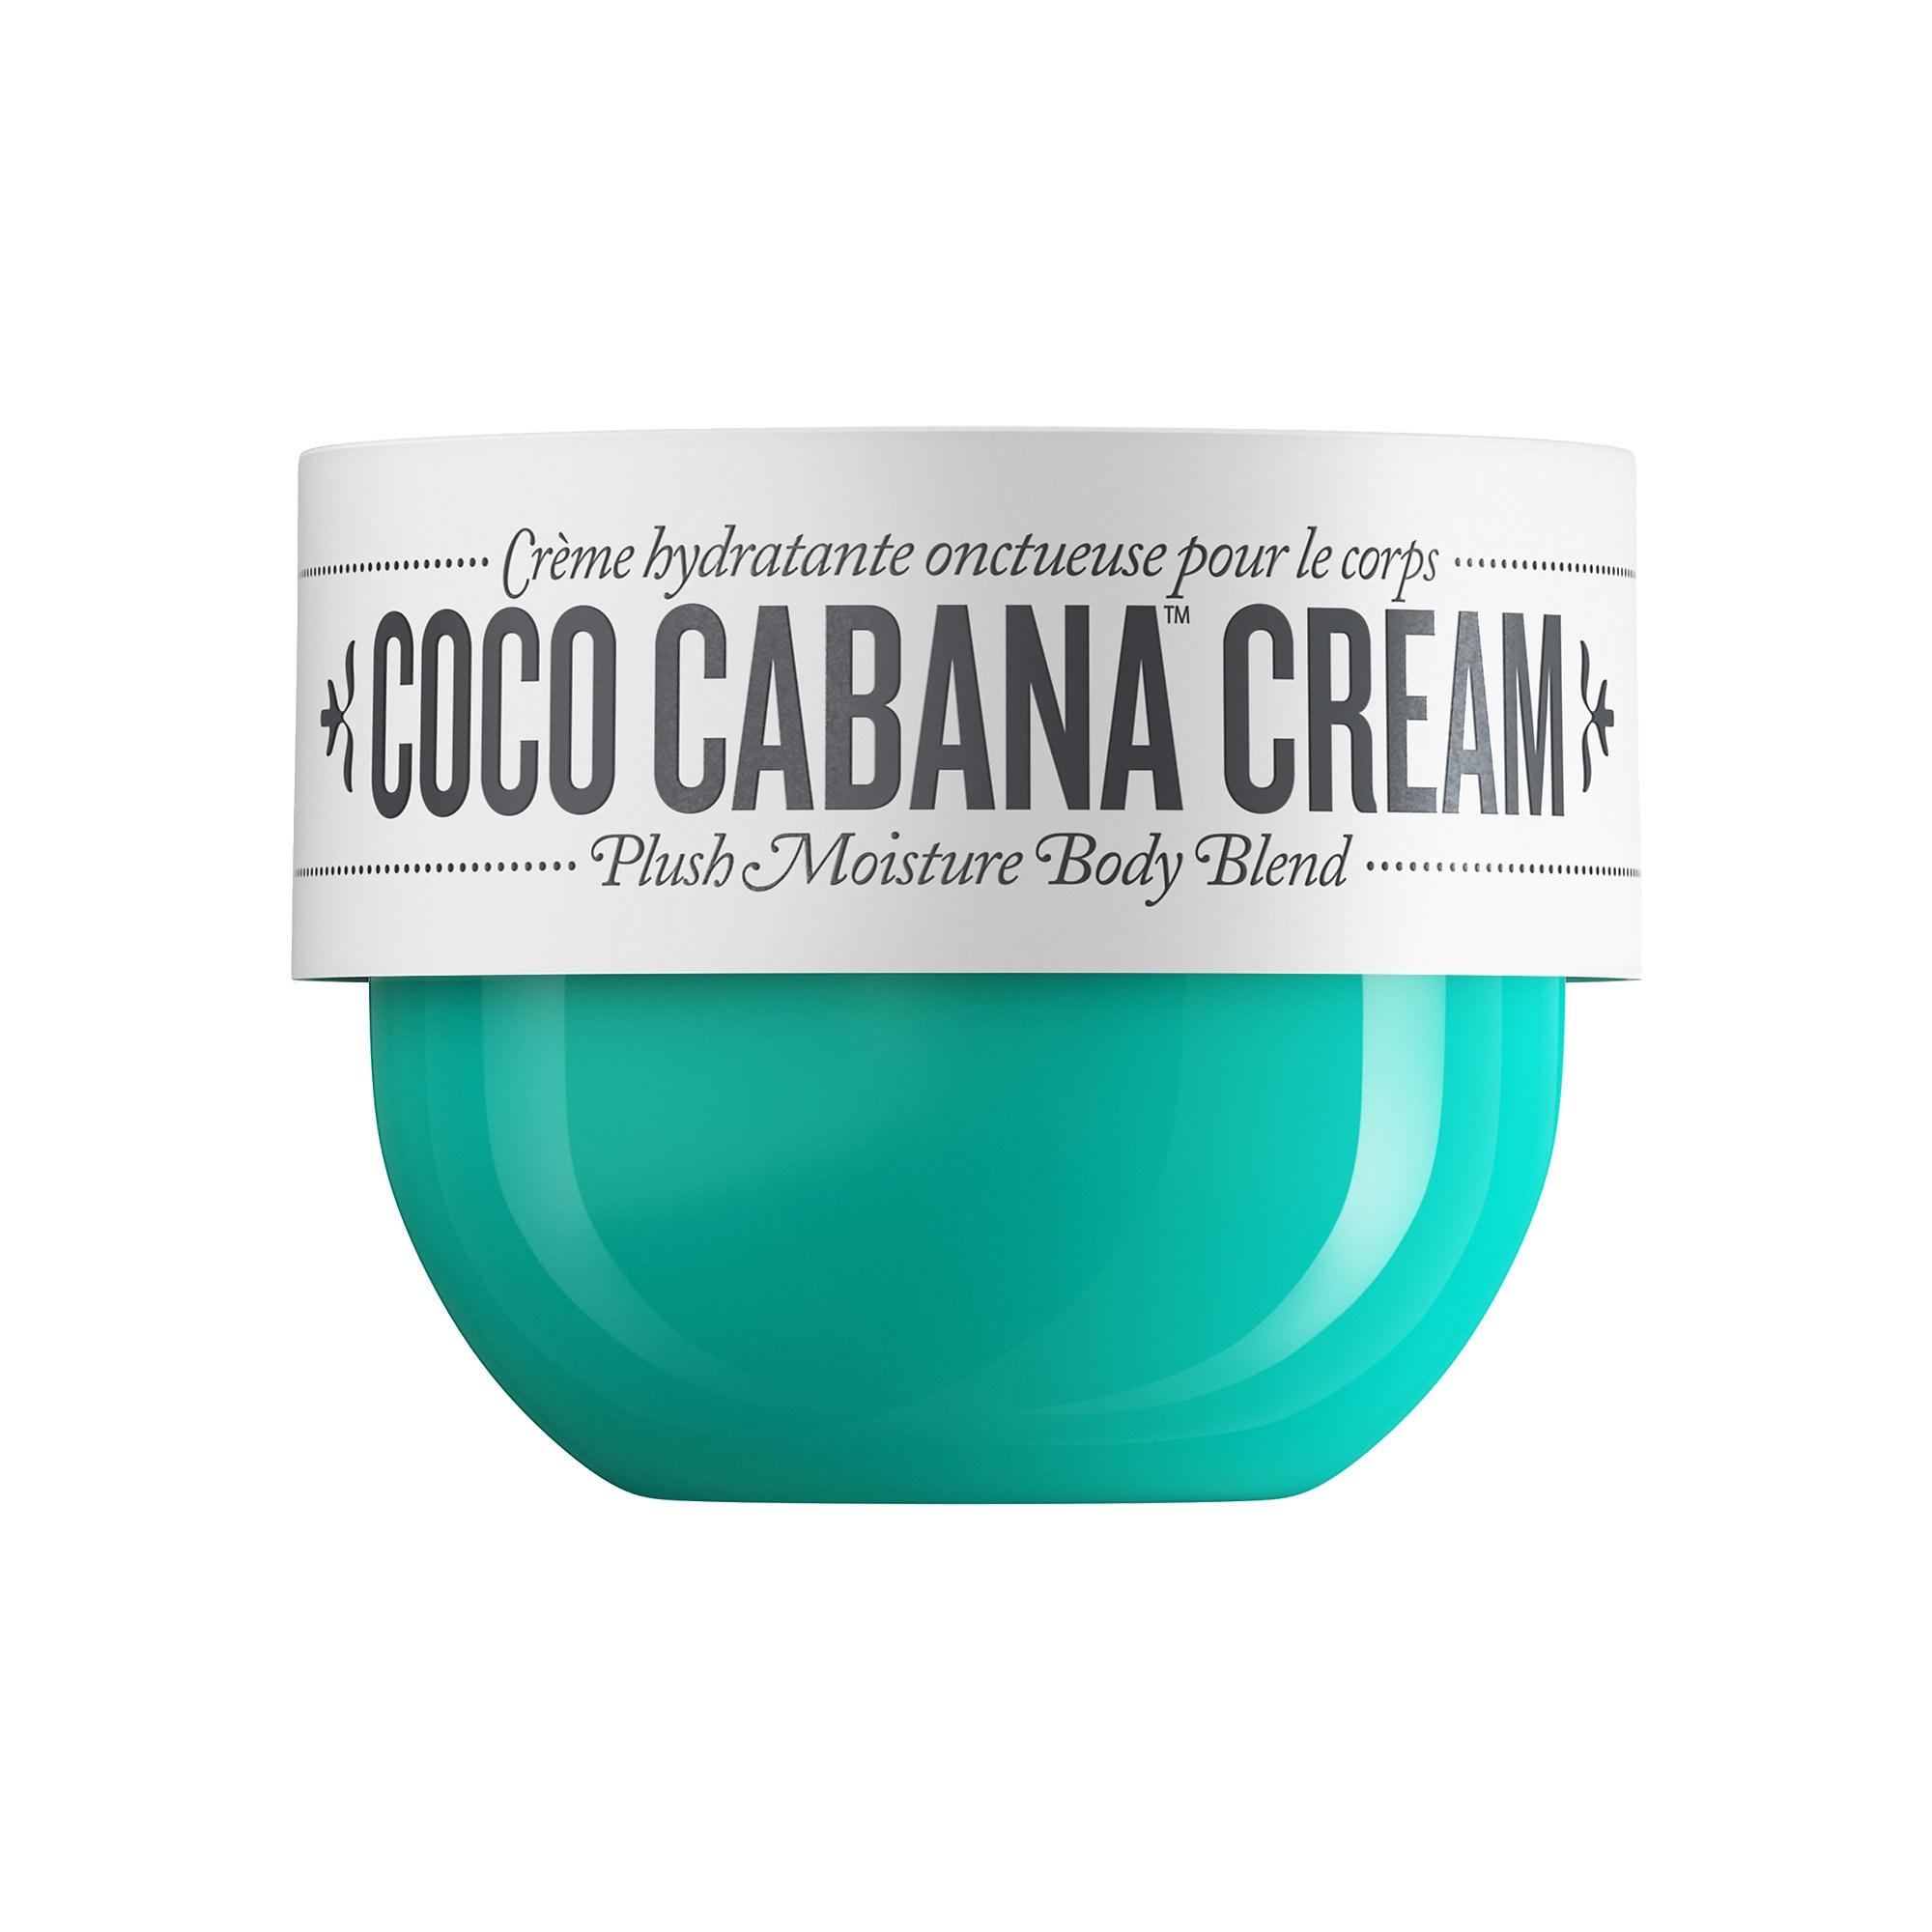 Sol De Janeiro - Coco Cabana Body Cream - With New Coconut Scent and Plush Moisture